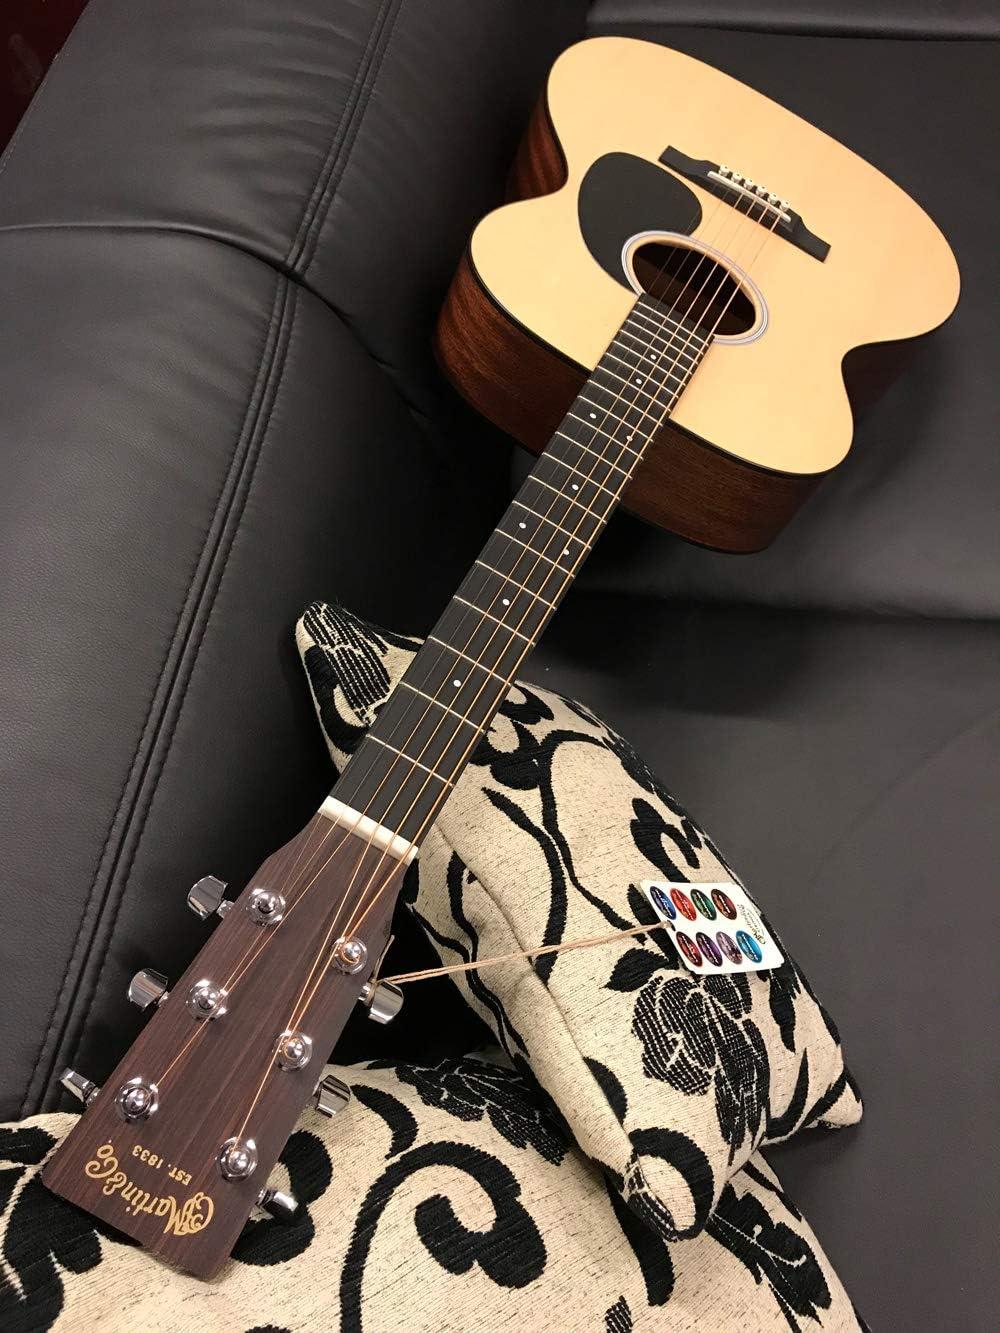 Martin 000RS2 - Guitarra electroacústica (incluye estuche)